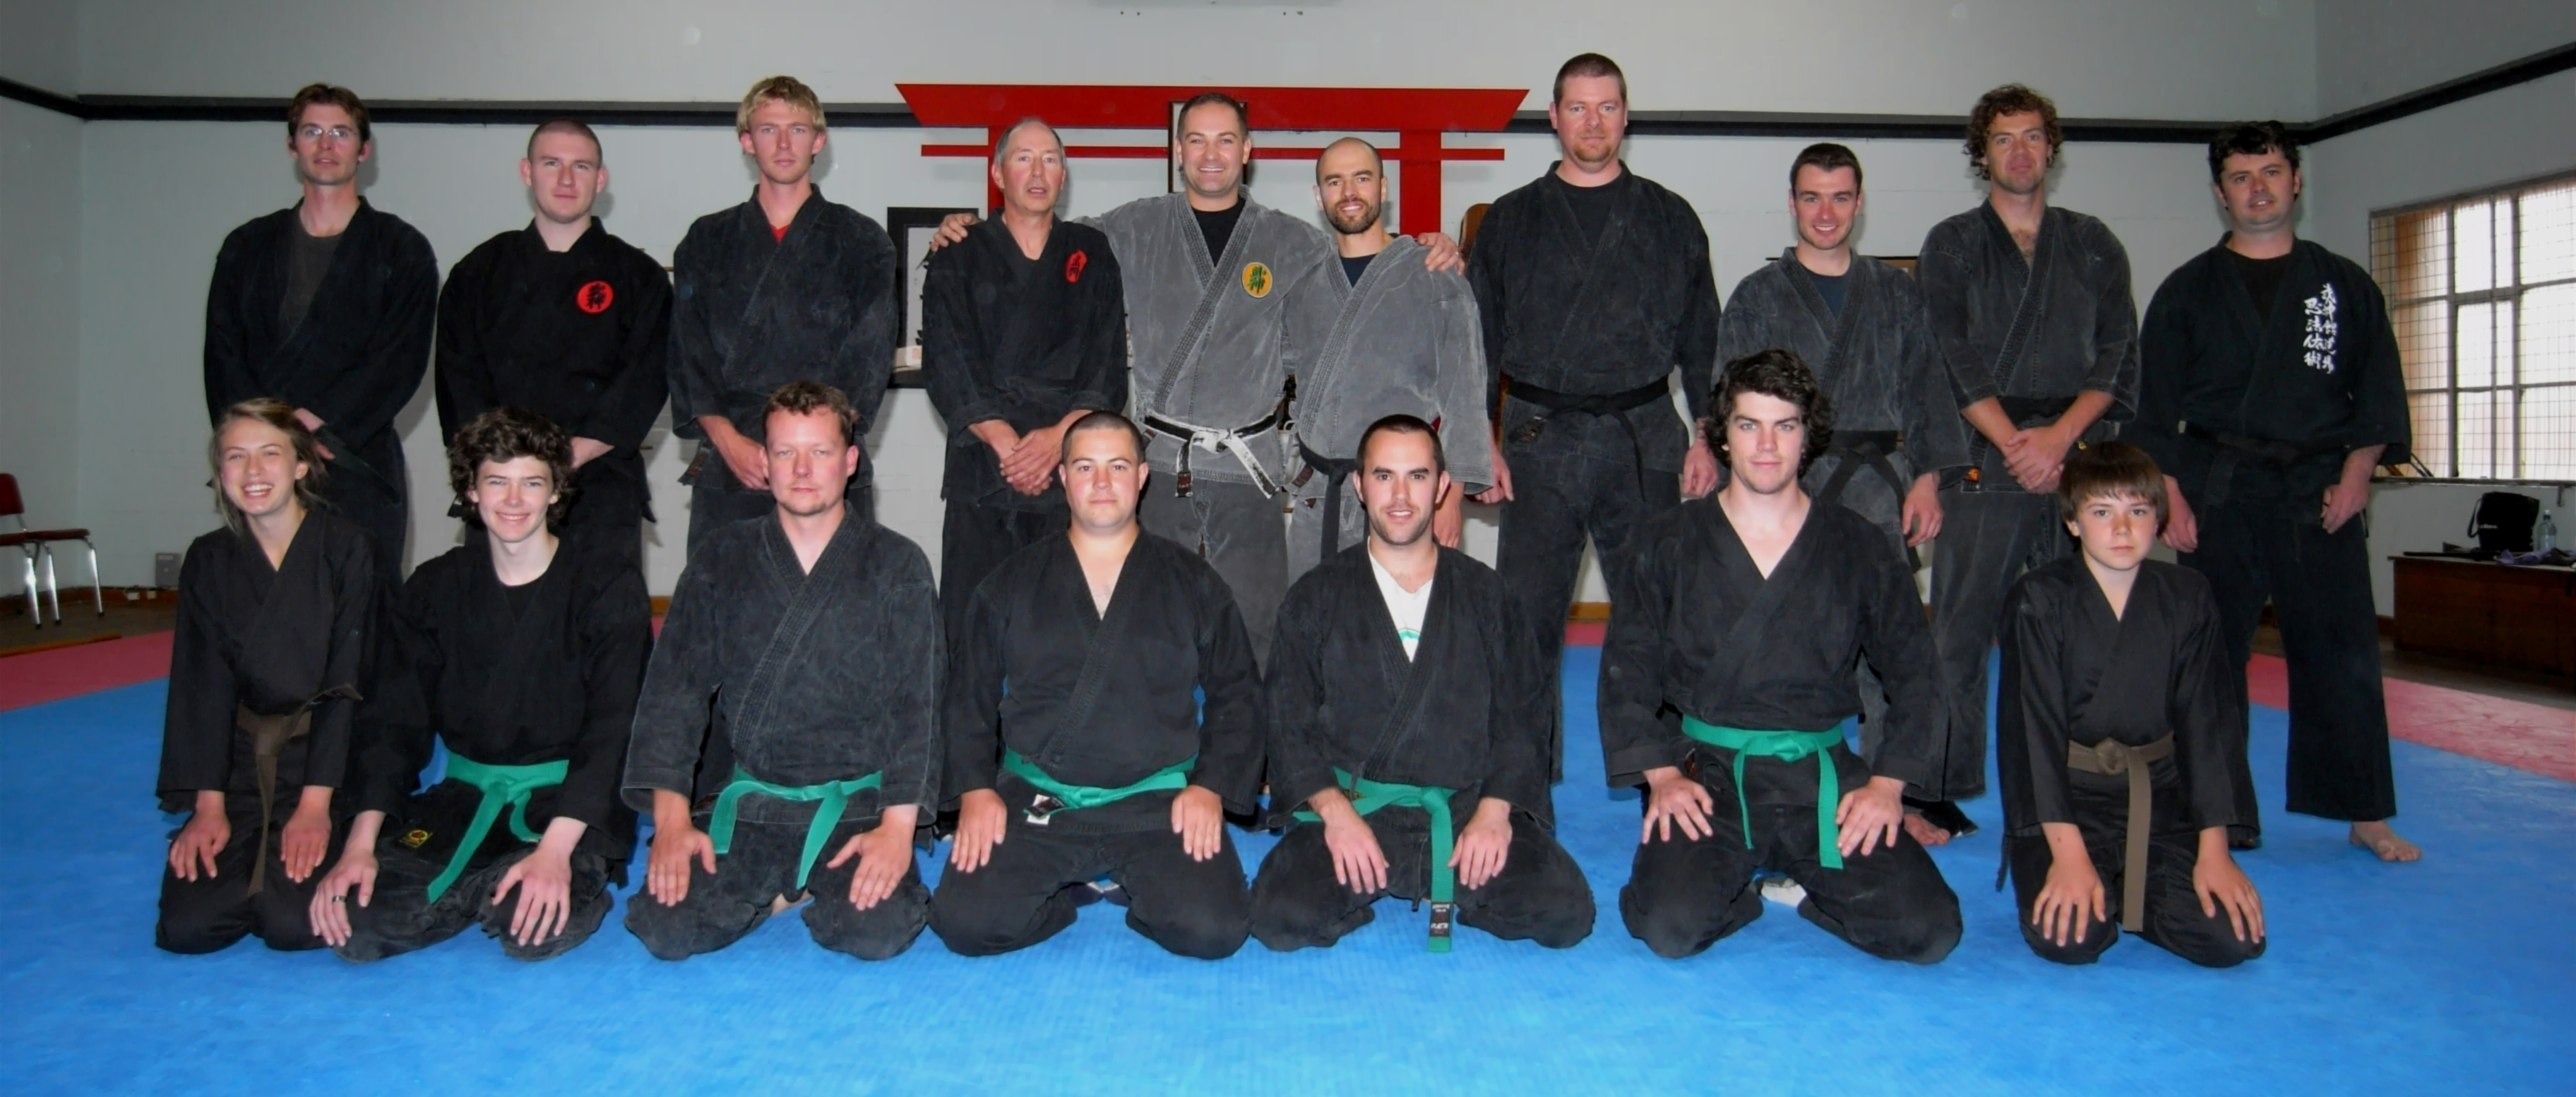 tasmania-seminar-2009-0041